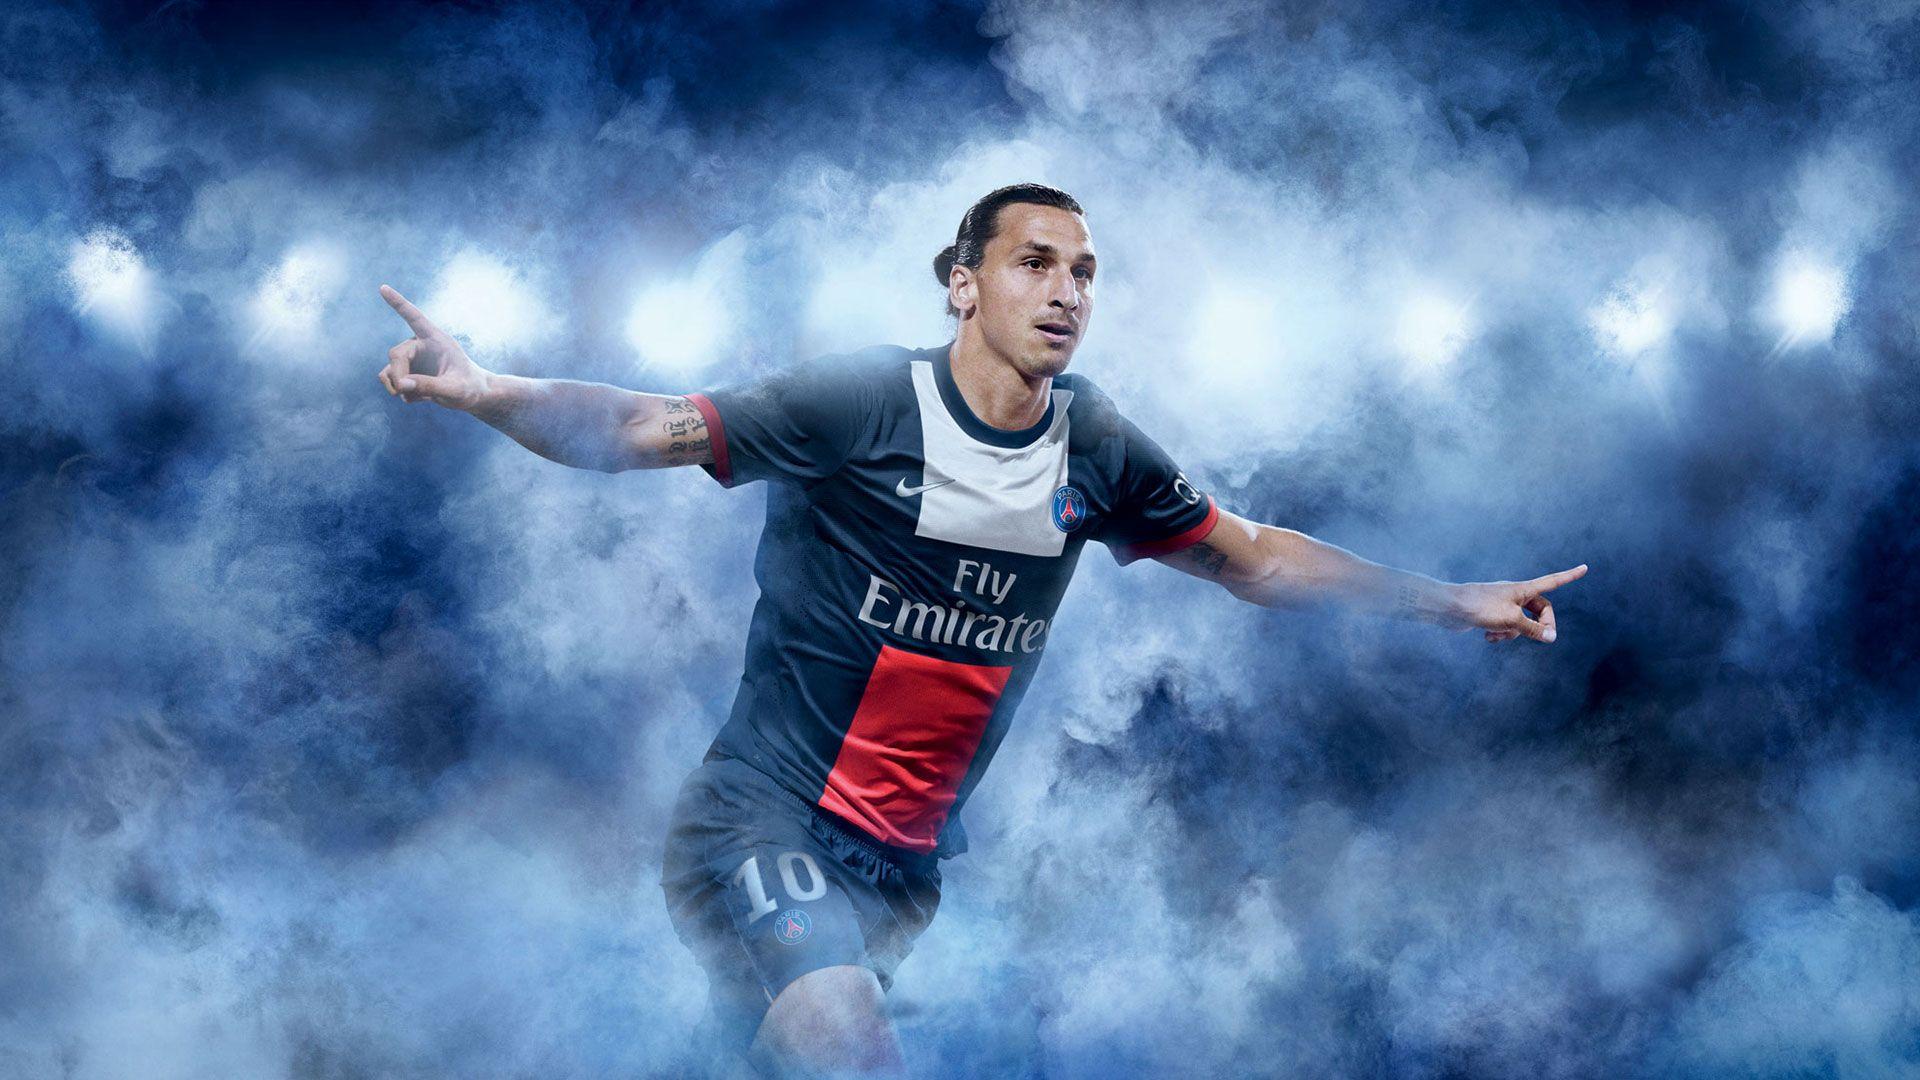 Fifa 2016 En iyi 10 Oyuncusu